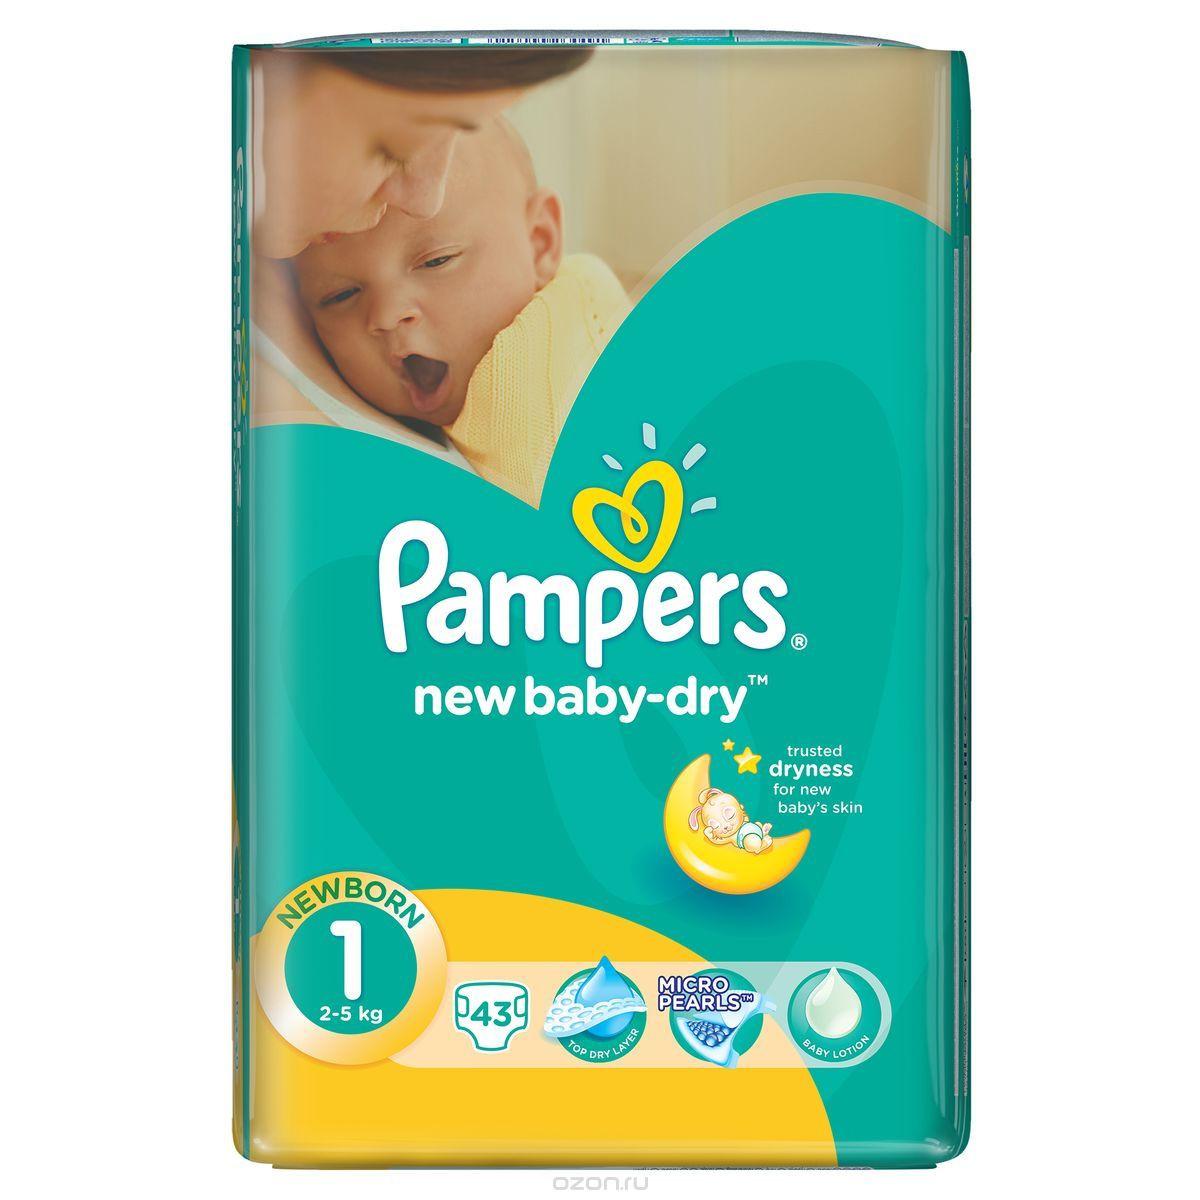 d1eb8ef22067 Pampers new baby-dry 1 подгузники 2 - 5 кг 43 шт - Интернет магазин